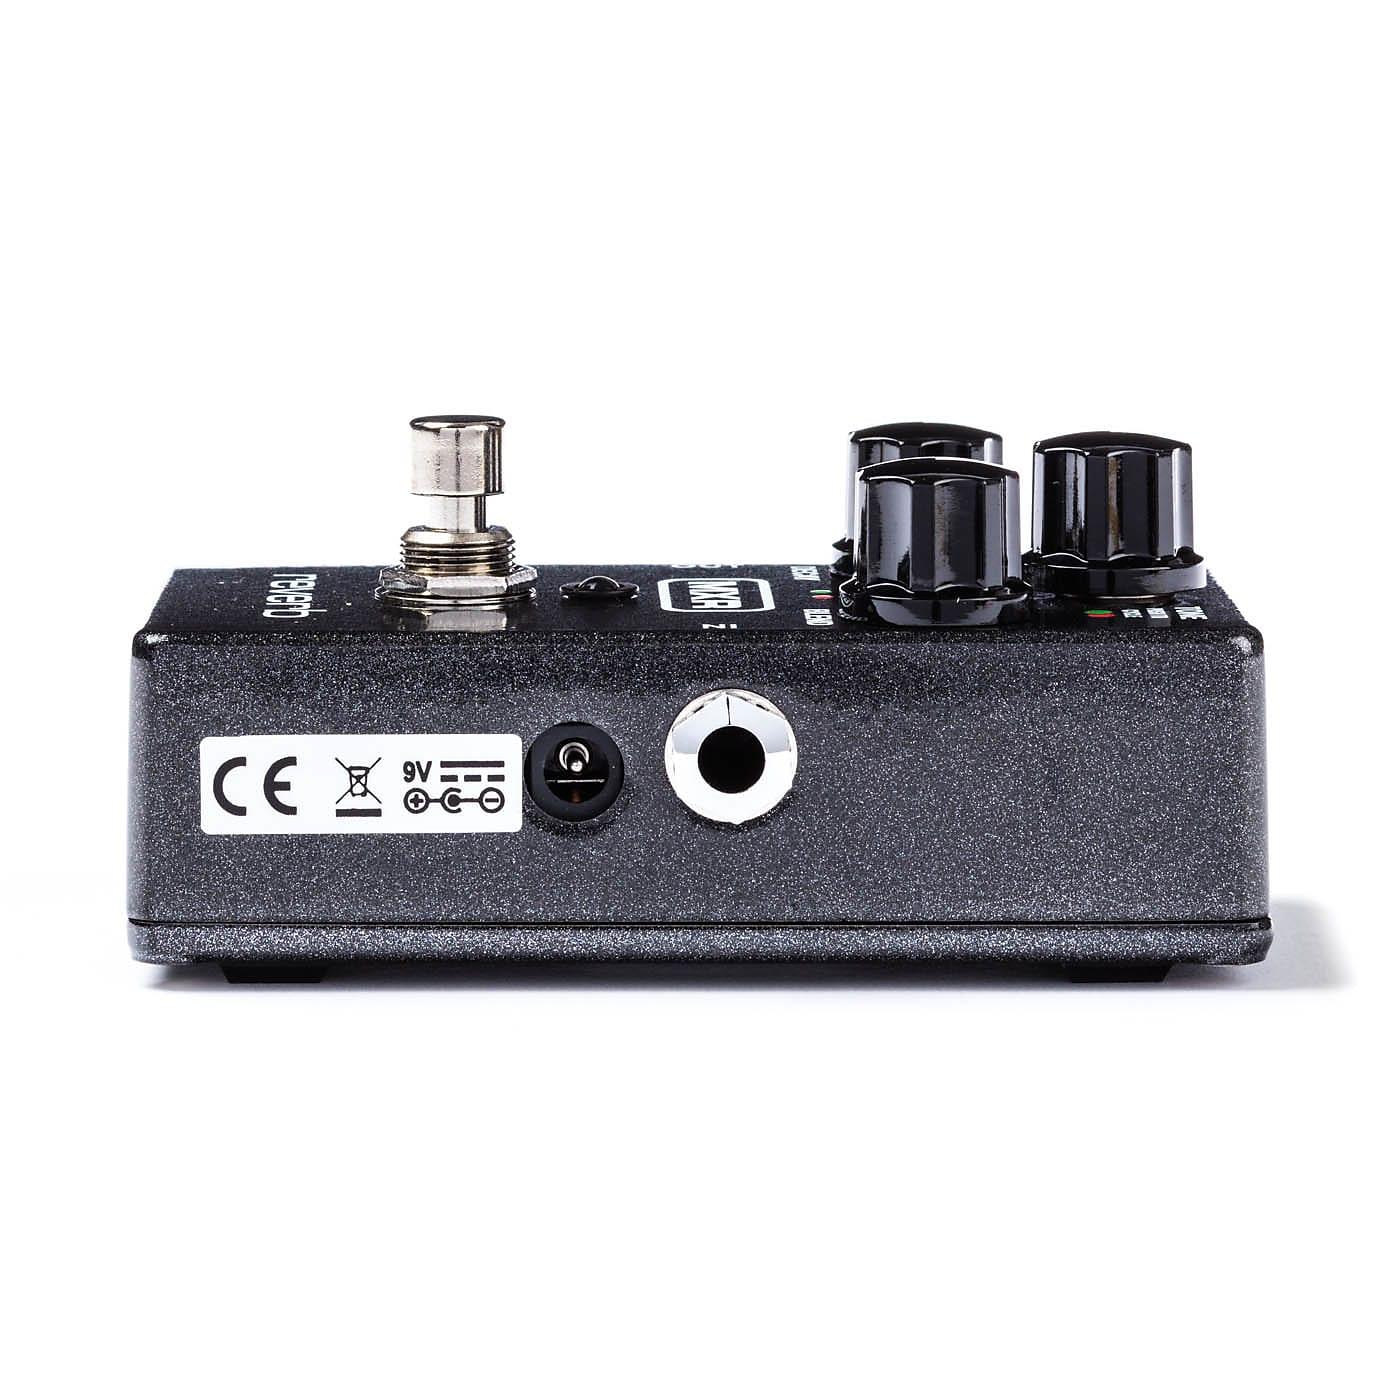 MXR M300 Reverb Effects Pedal